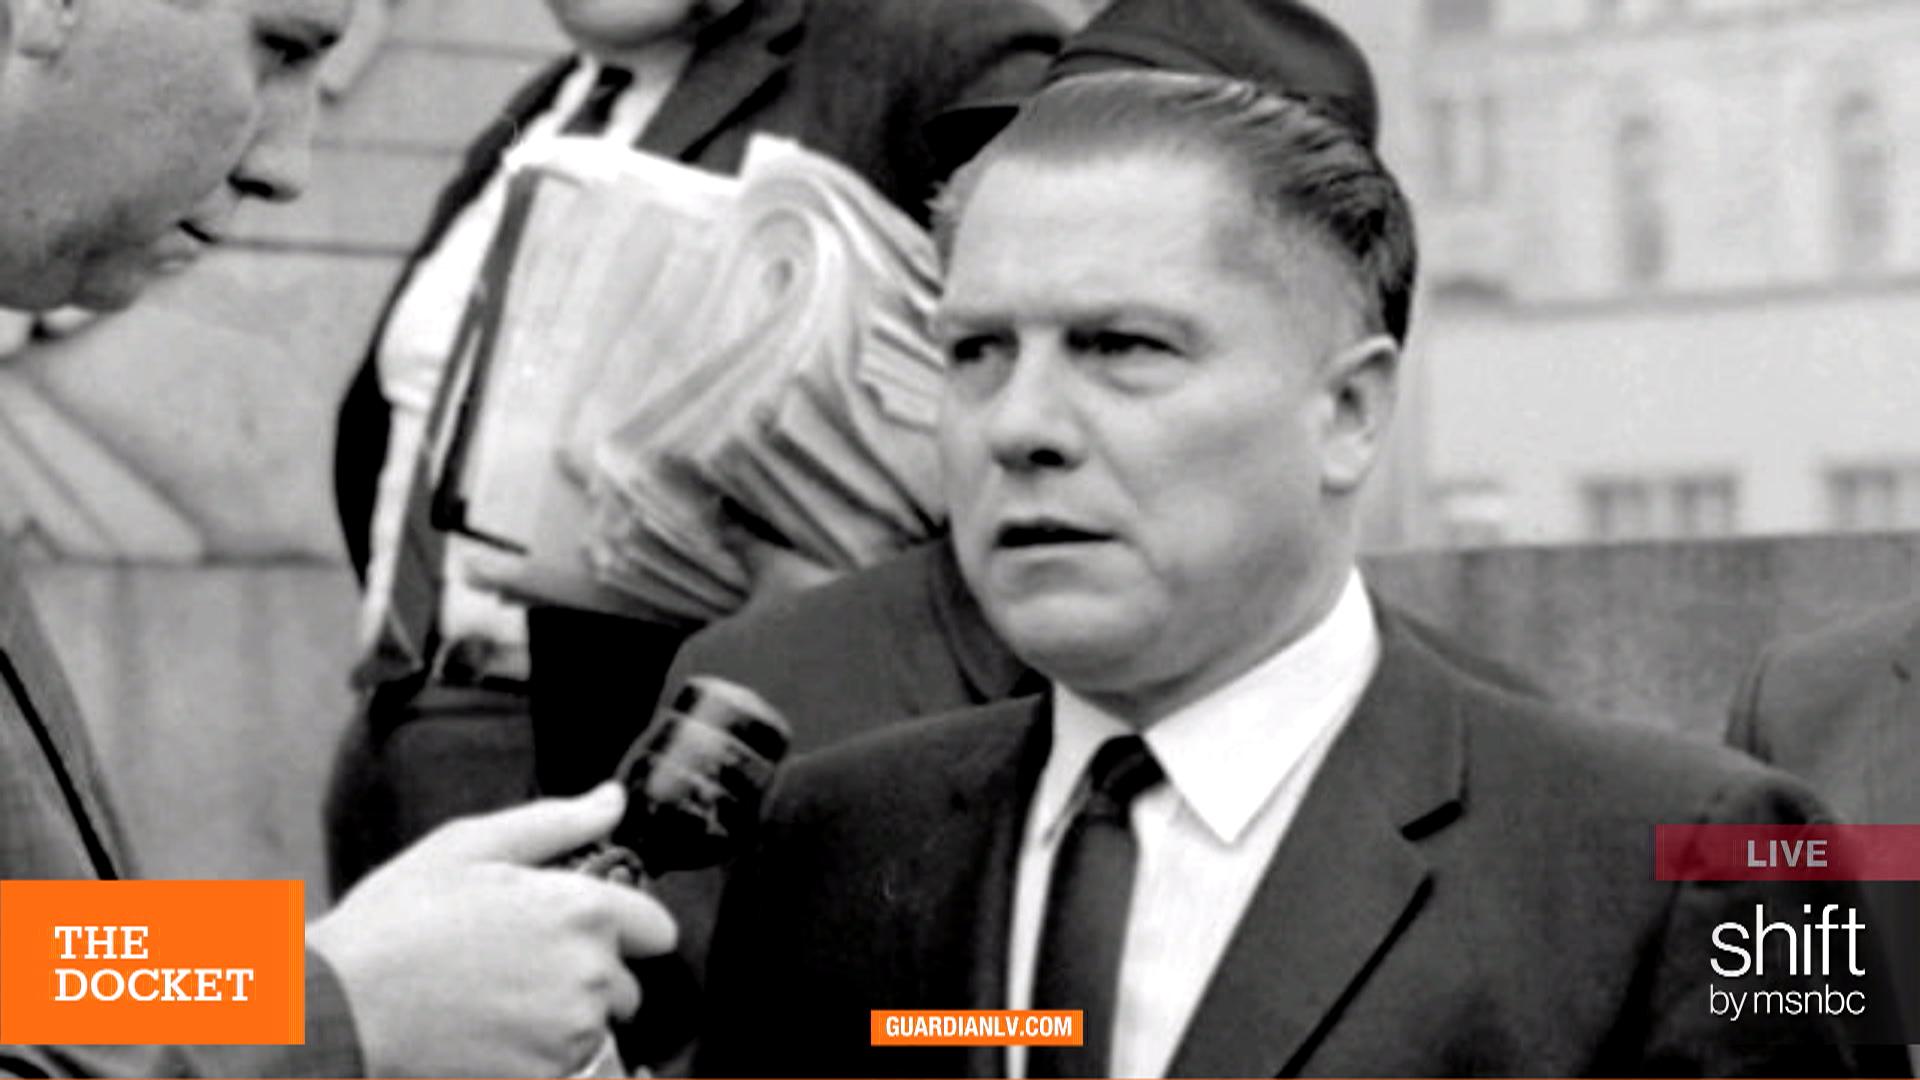 Who killed Jimmy Hoffa 40 years ago?